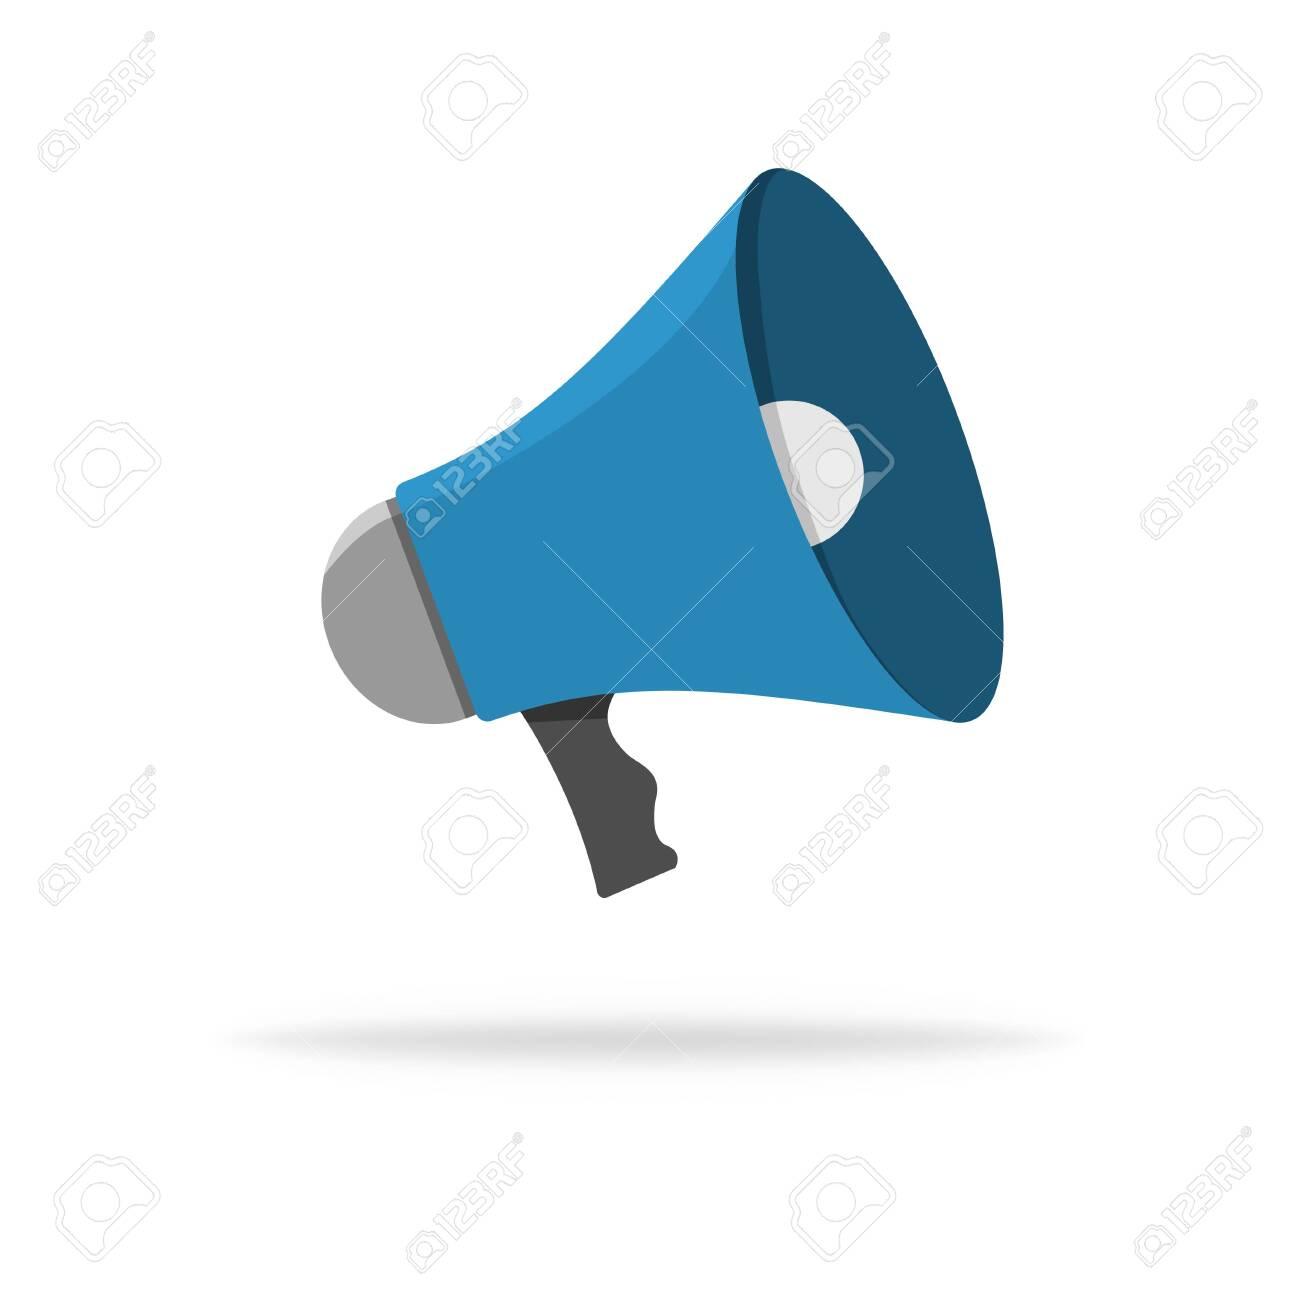 speaker vector icon loudspeaker or megaphone illustration sound royalty free cliparts vectors and stock illustration image 146795573 speaker vector icon loudspeaker or megaphone illustration sound